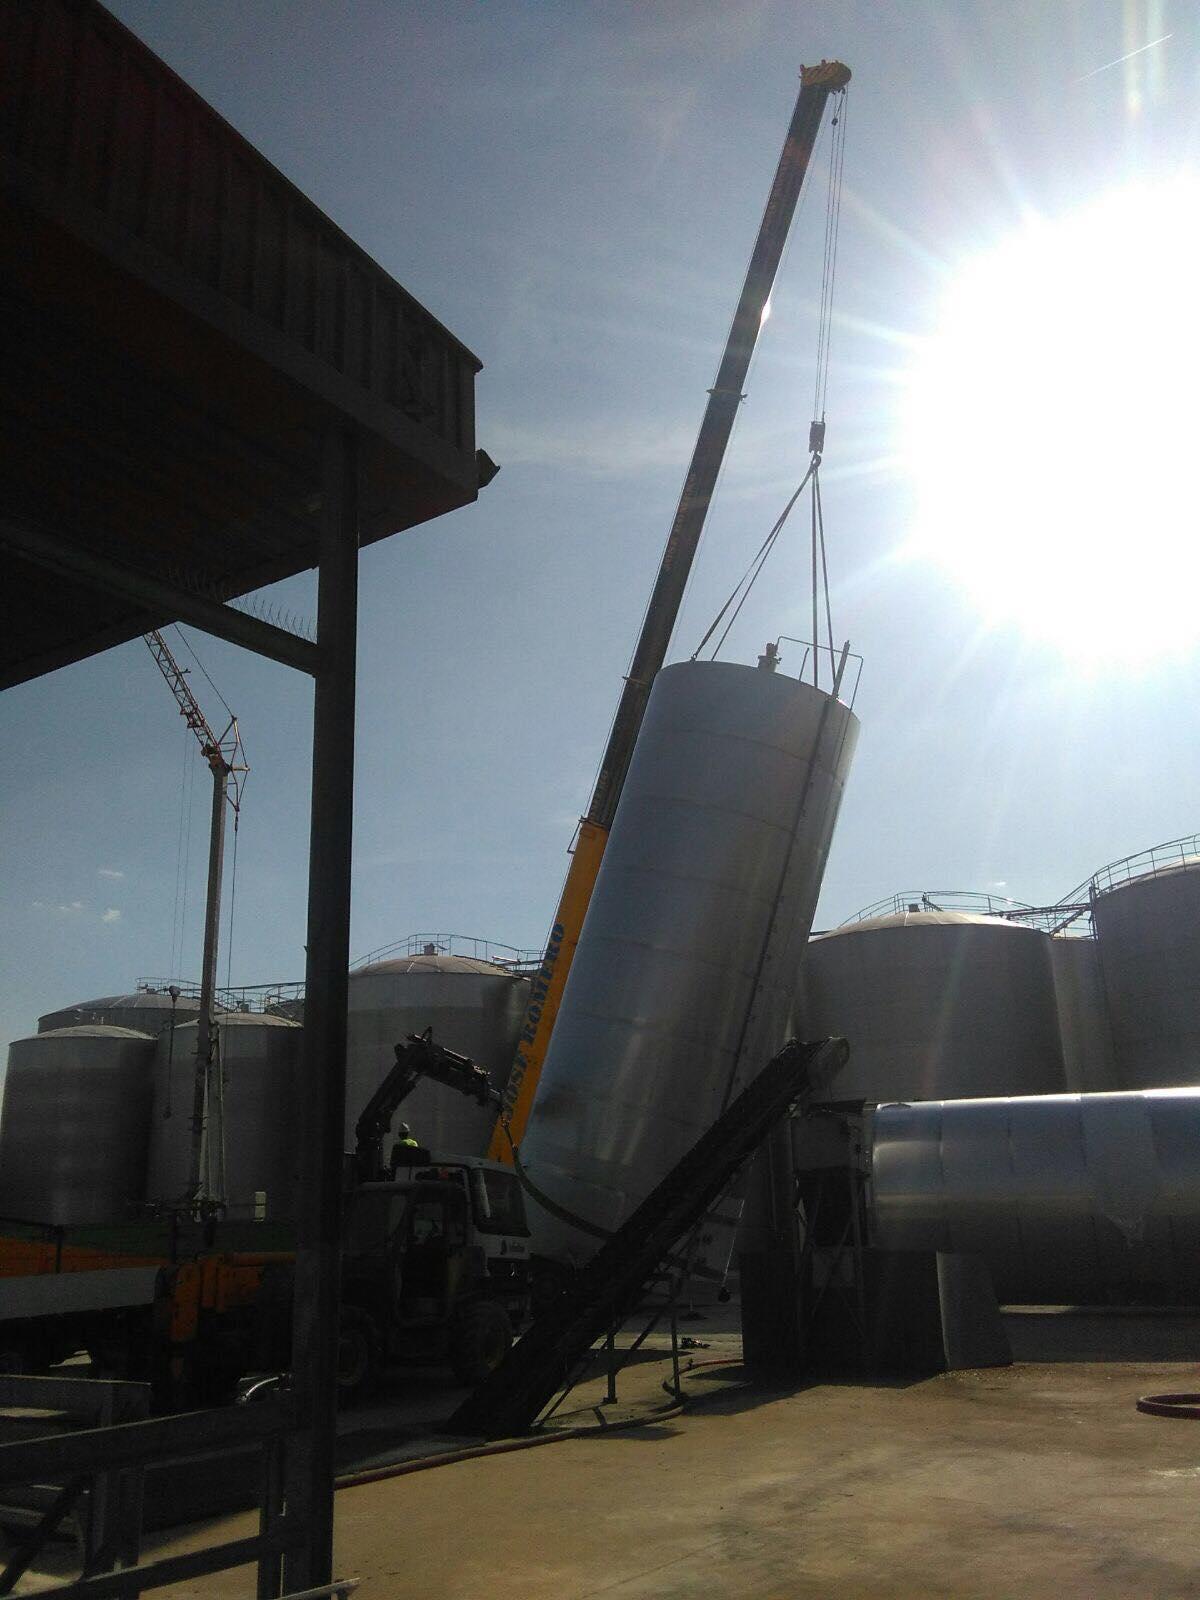 modernizacion bodegas san jose herencia 4 - Bodegas San José mejora y moderniza sus instalaciones